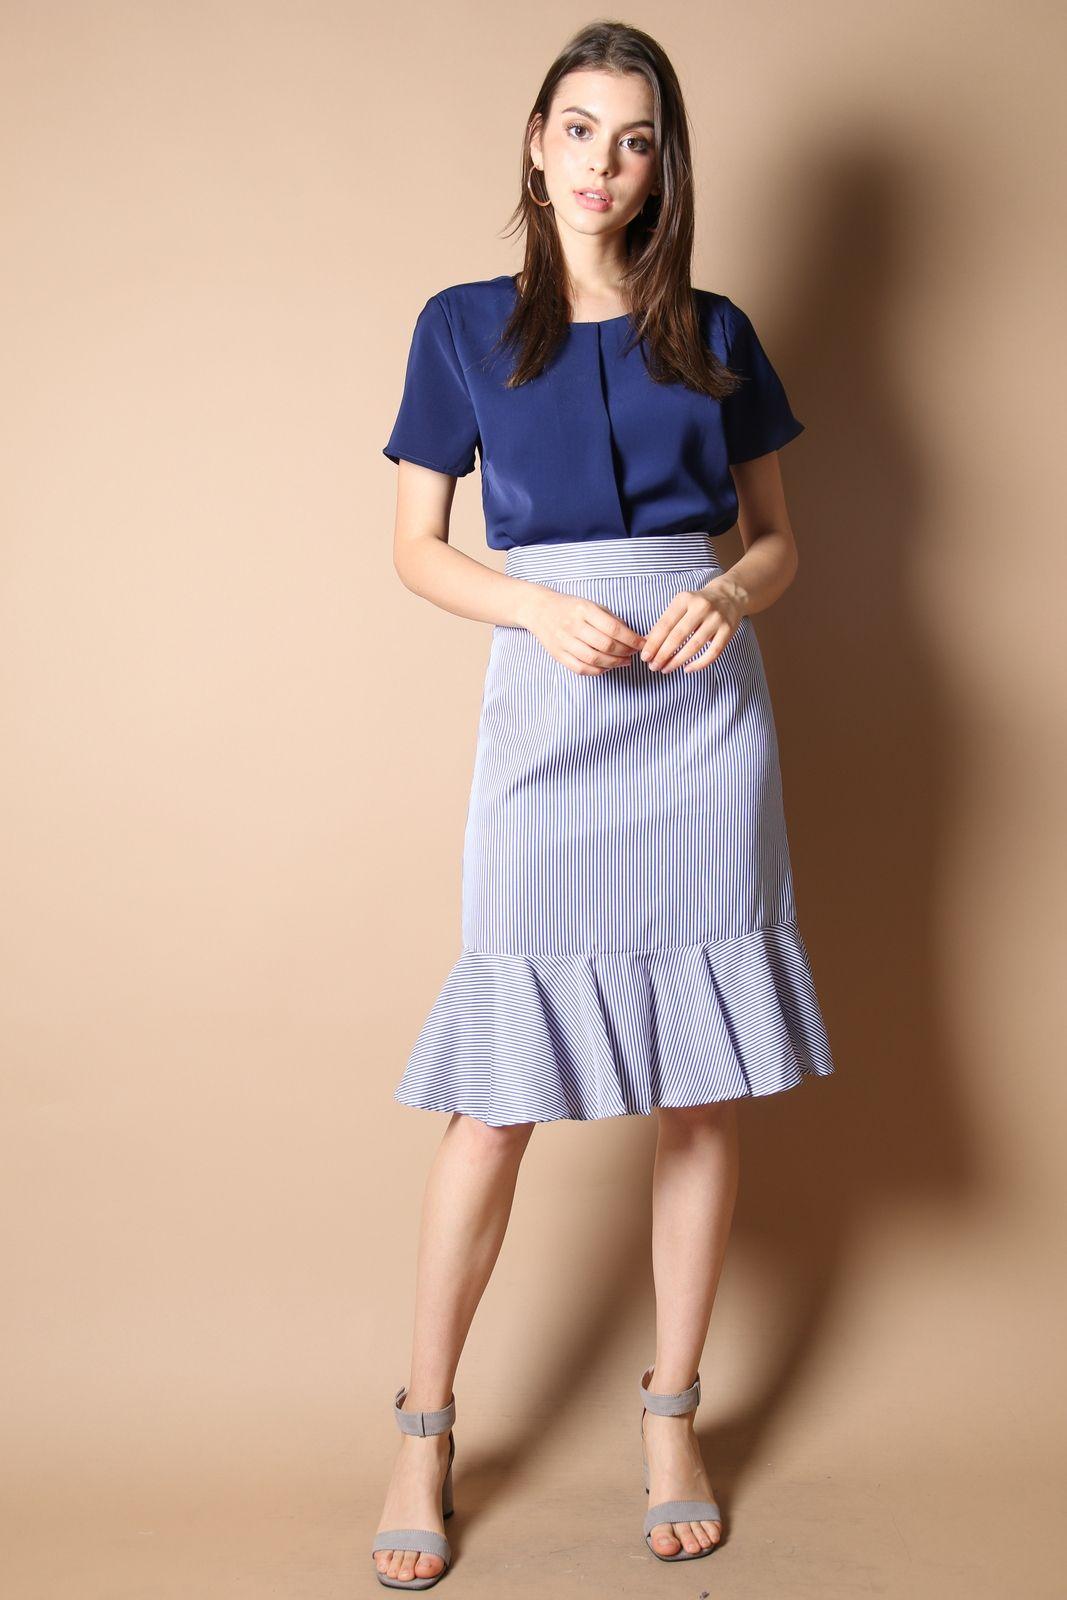 22160a5d9f Sophie High Waist Skirt in Dark Blue | Various Dresses Styles ...